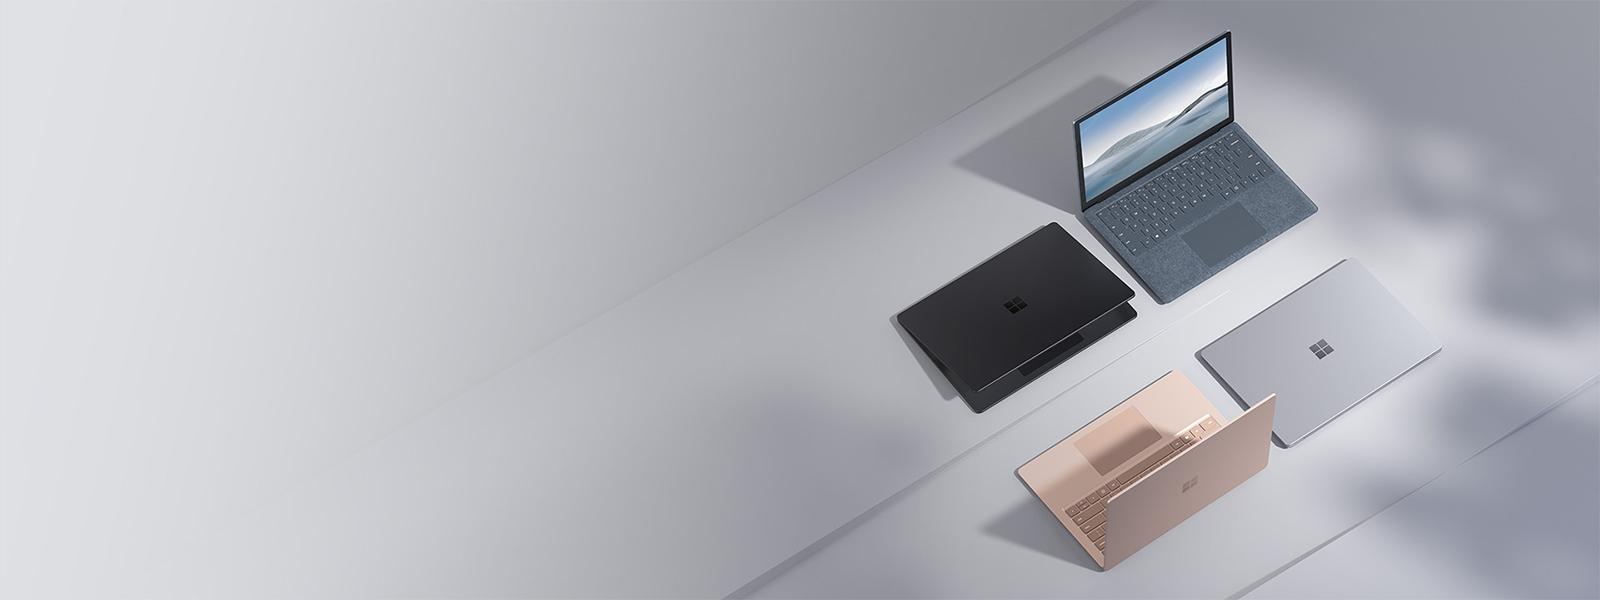 全新 Surface Laptop 4